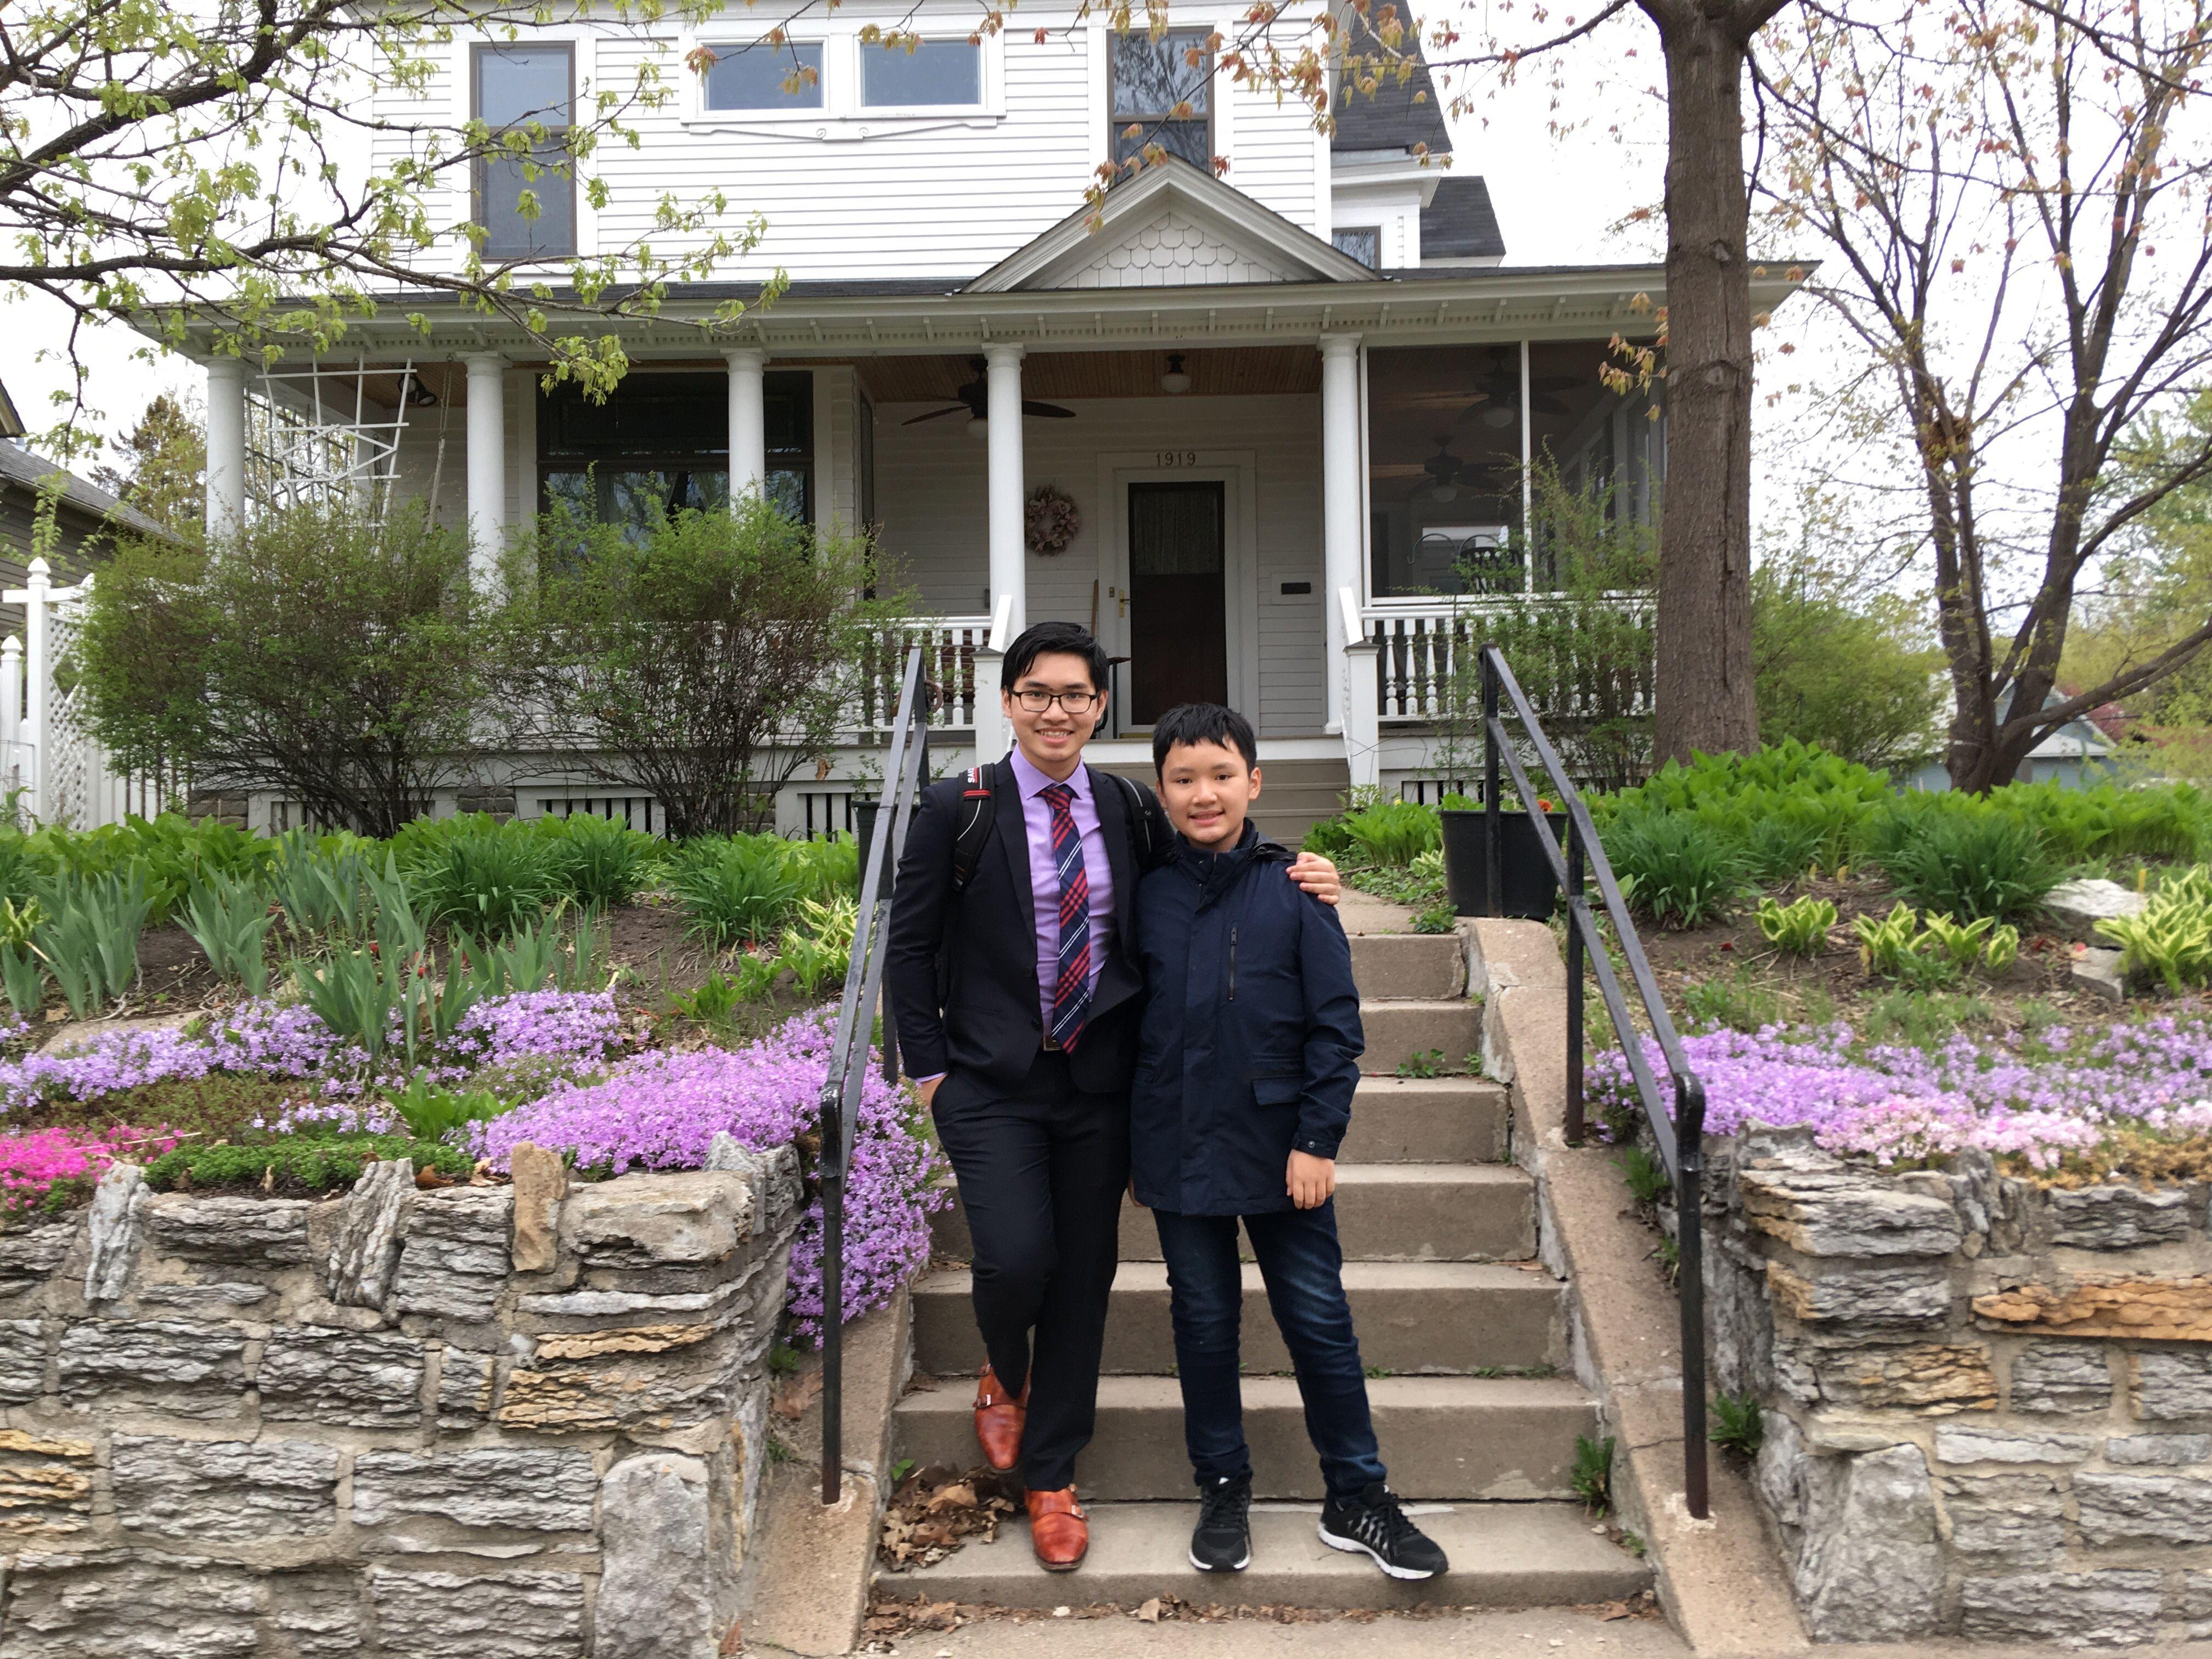 Hoang Anh Thai V. - Fun in Uptown! (Minneapolis, MN)   Meetup